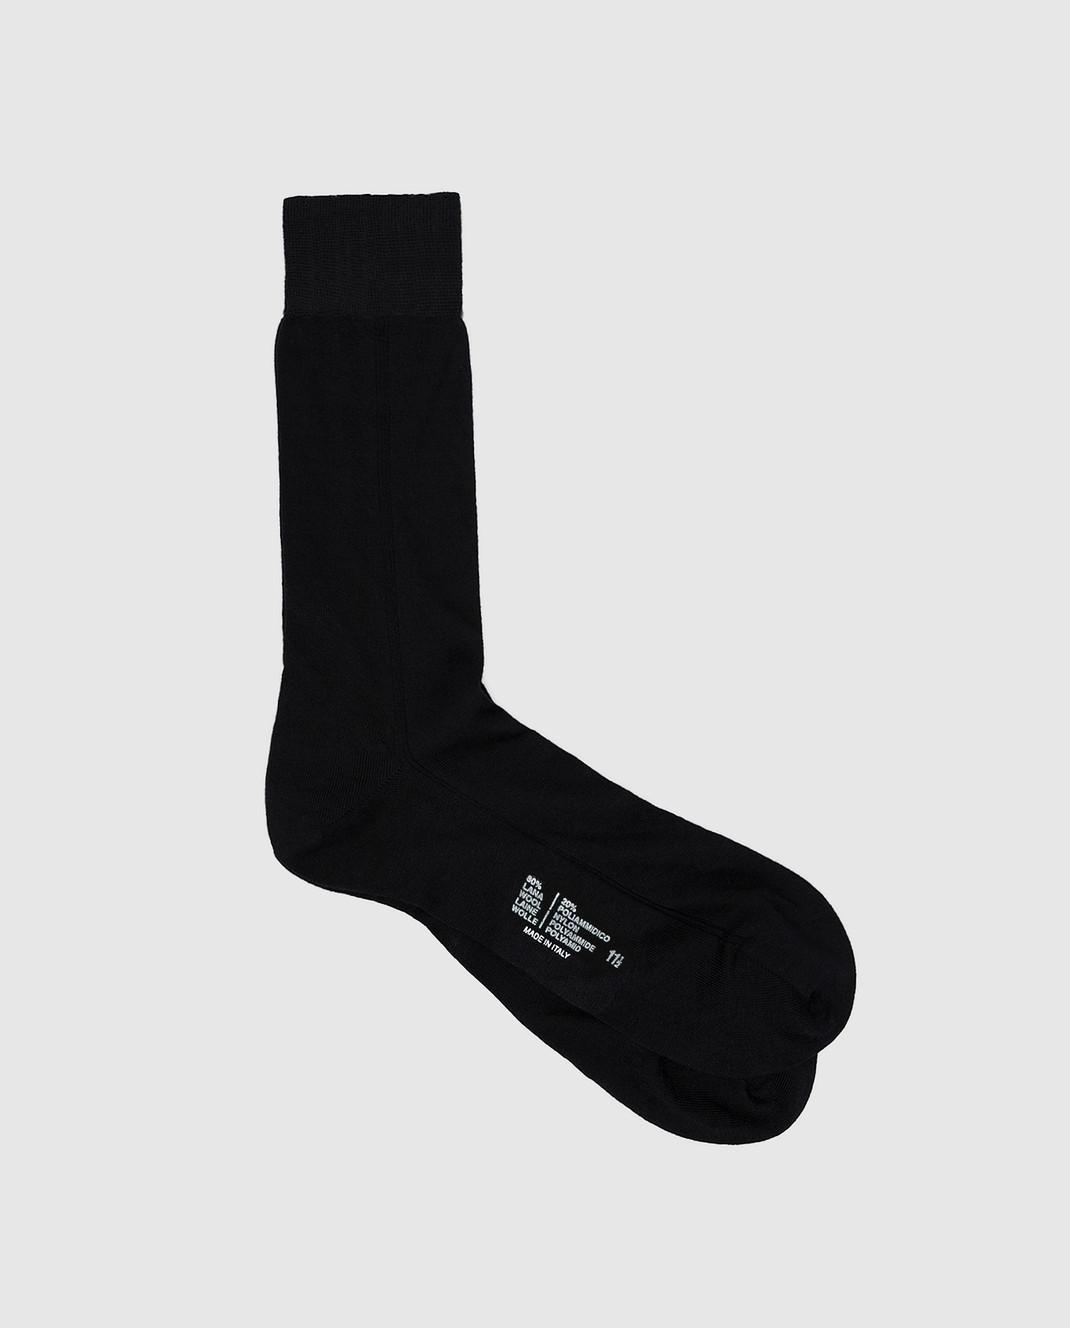 RiminiVeste Черные носки из шерсти WN8011EMINENCE